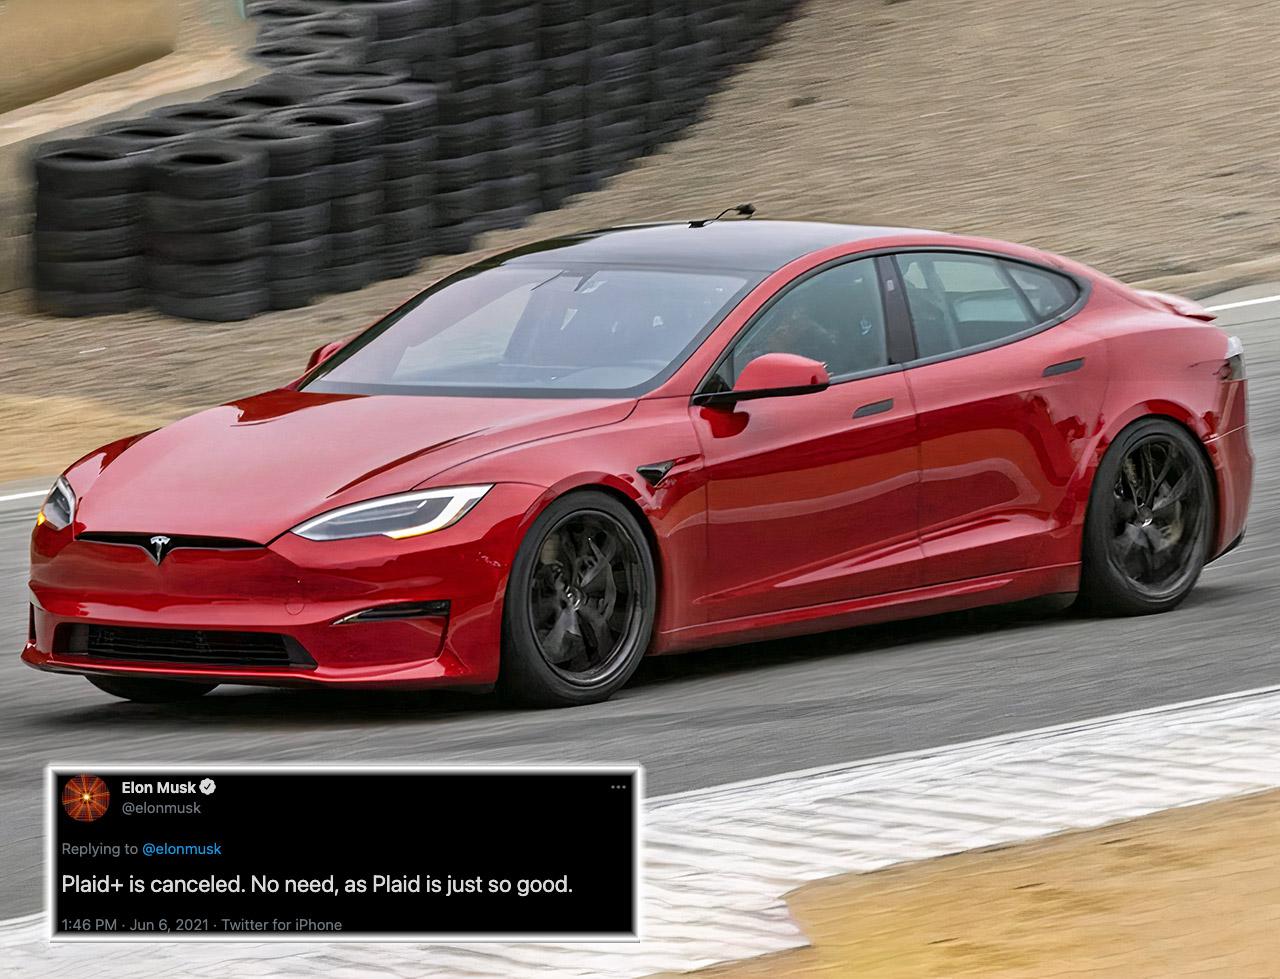 Elon Musk Tesla Model S Plaid Plus Canceled